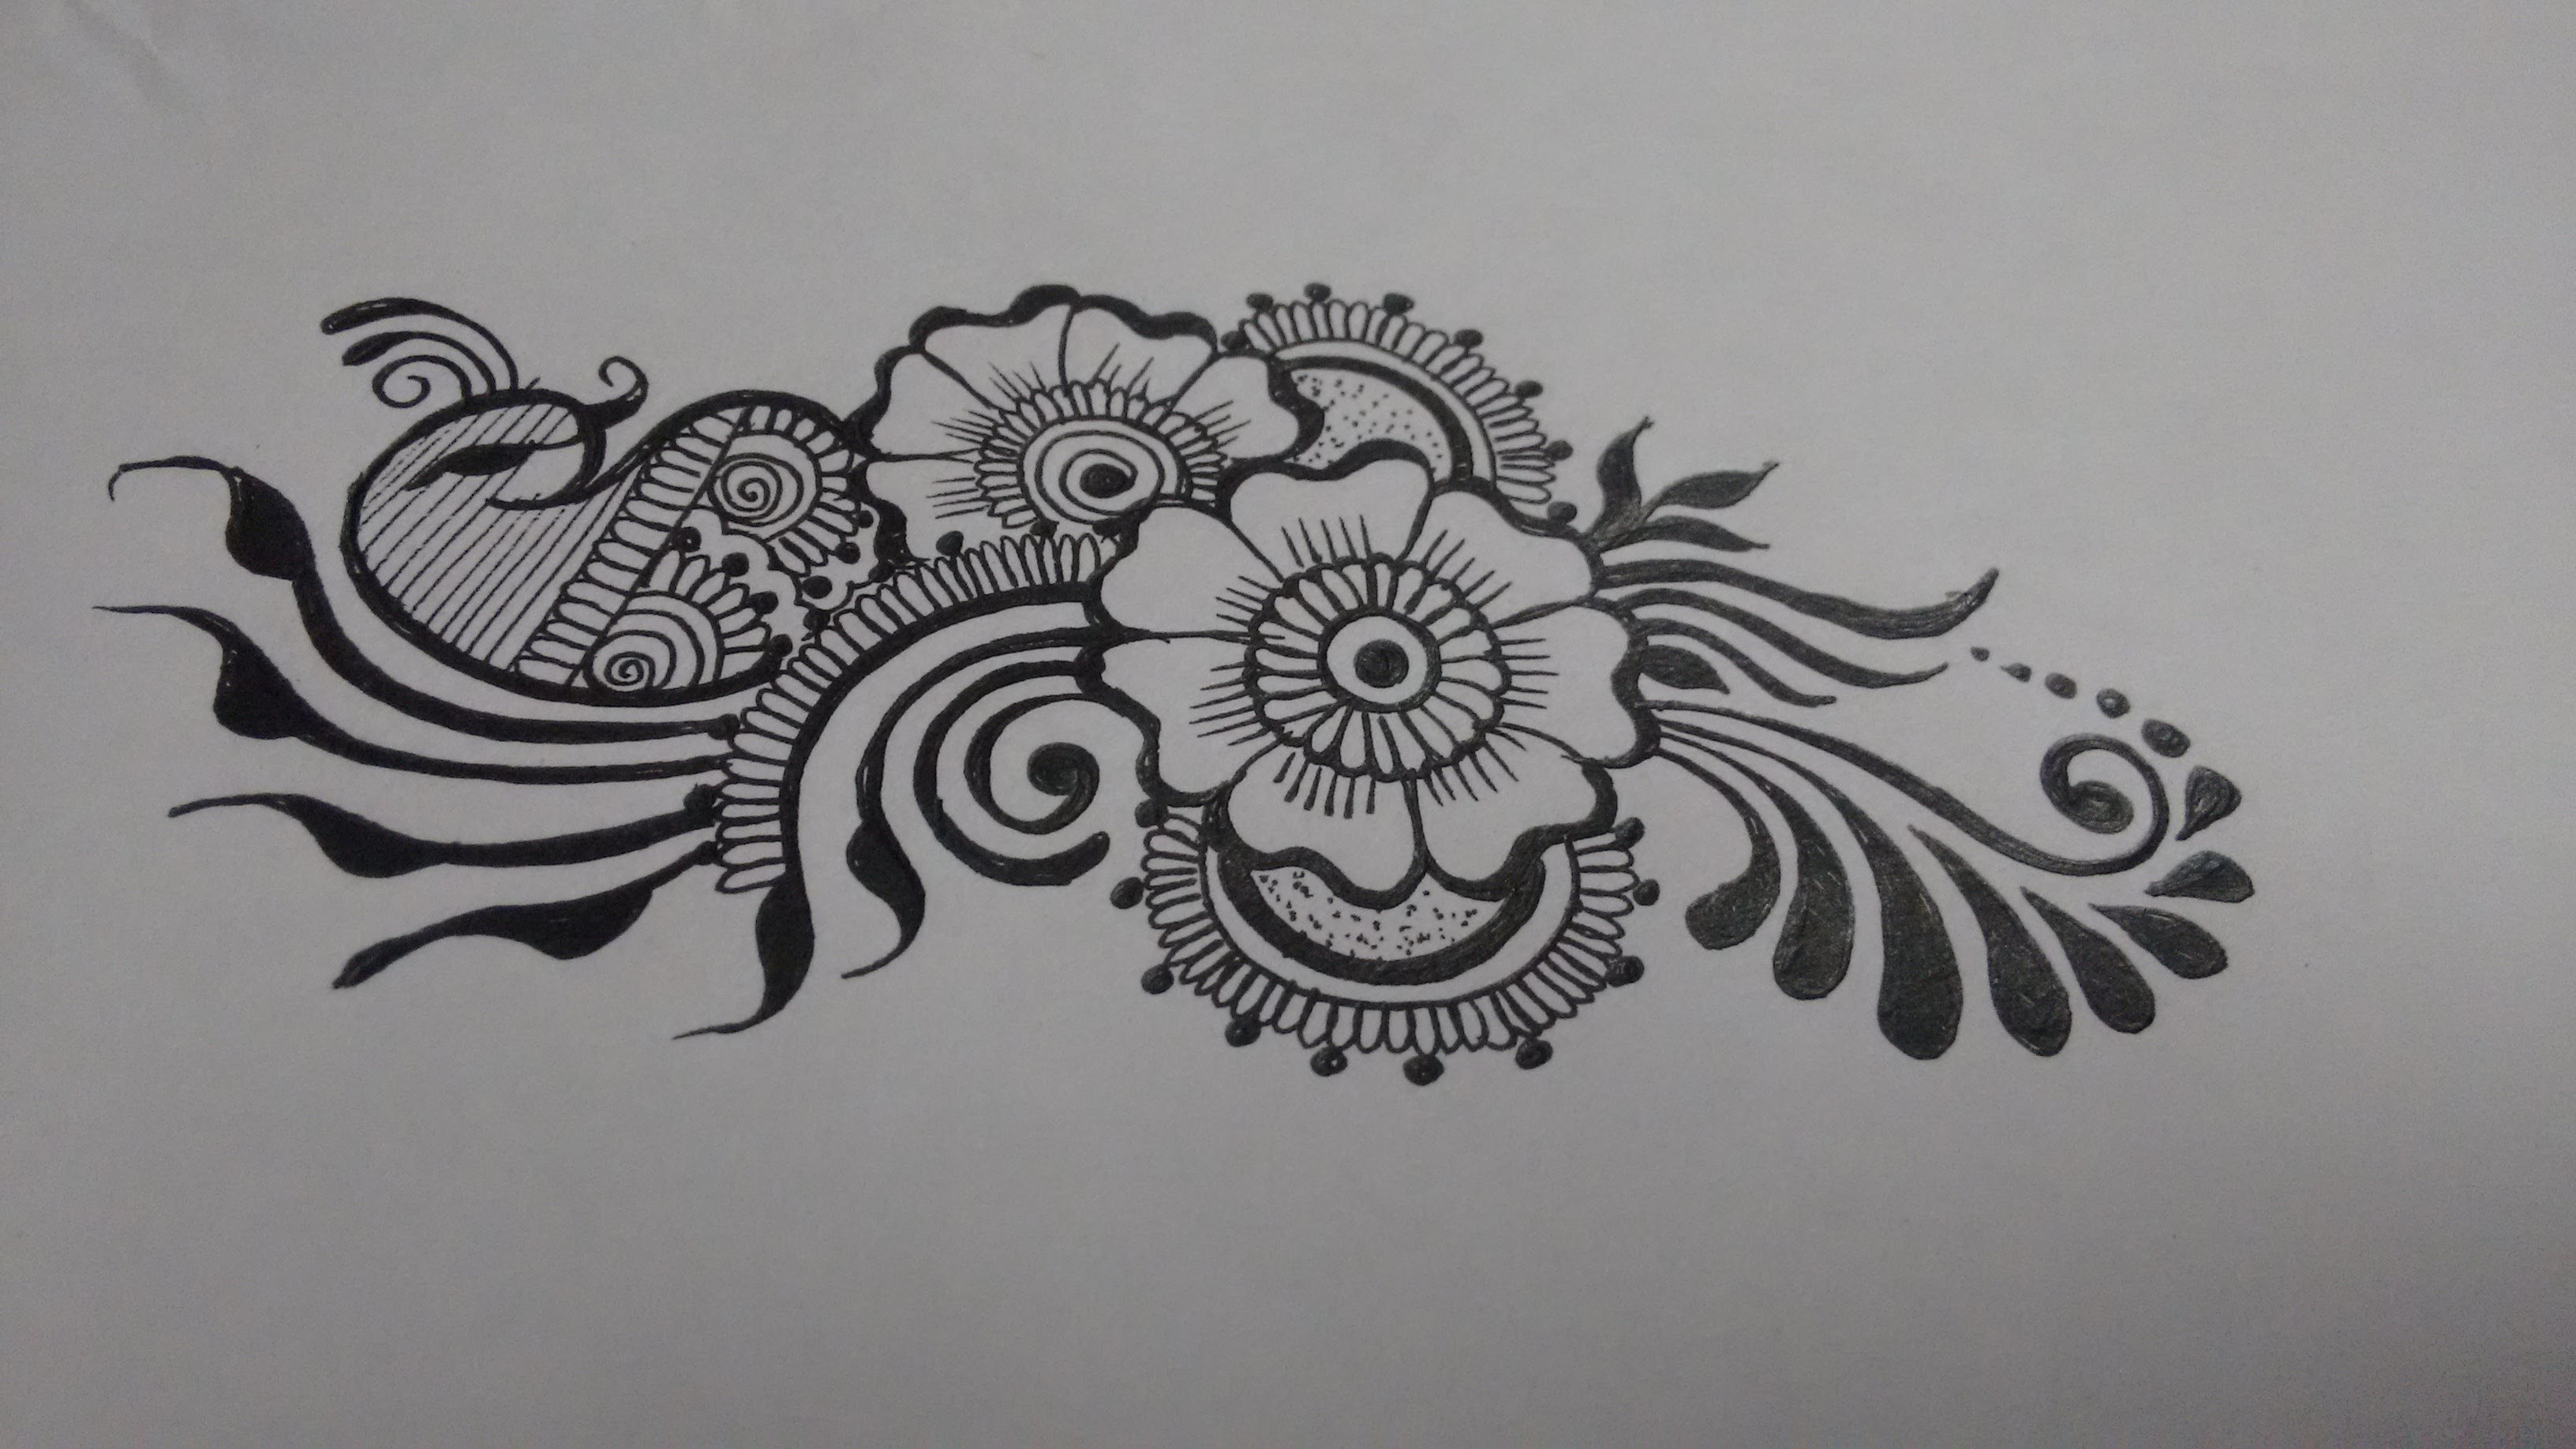 Easy Diy Mehndi Designs : How to diy easy beautiful mehndi henna designs for hands